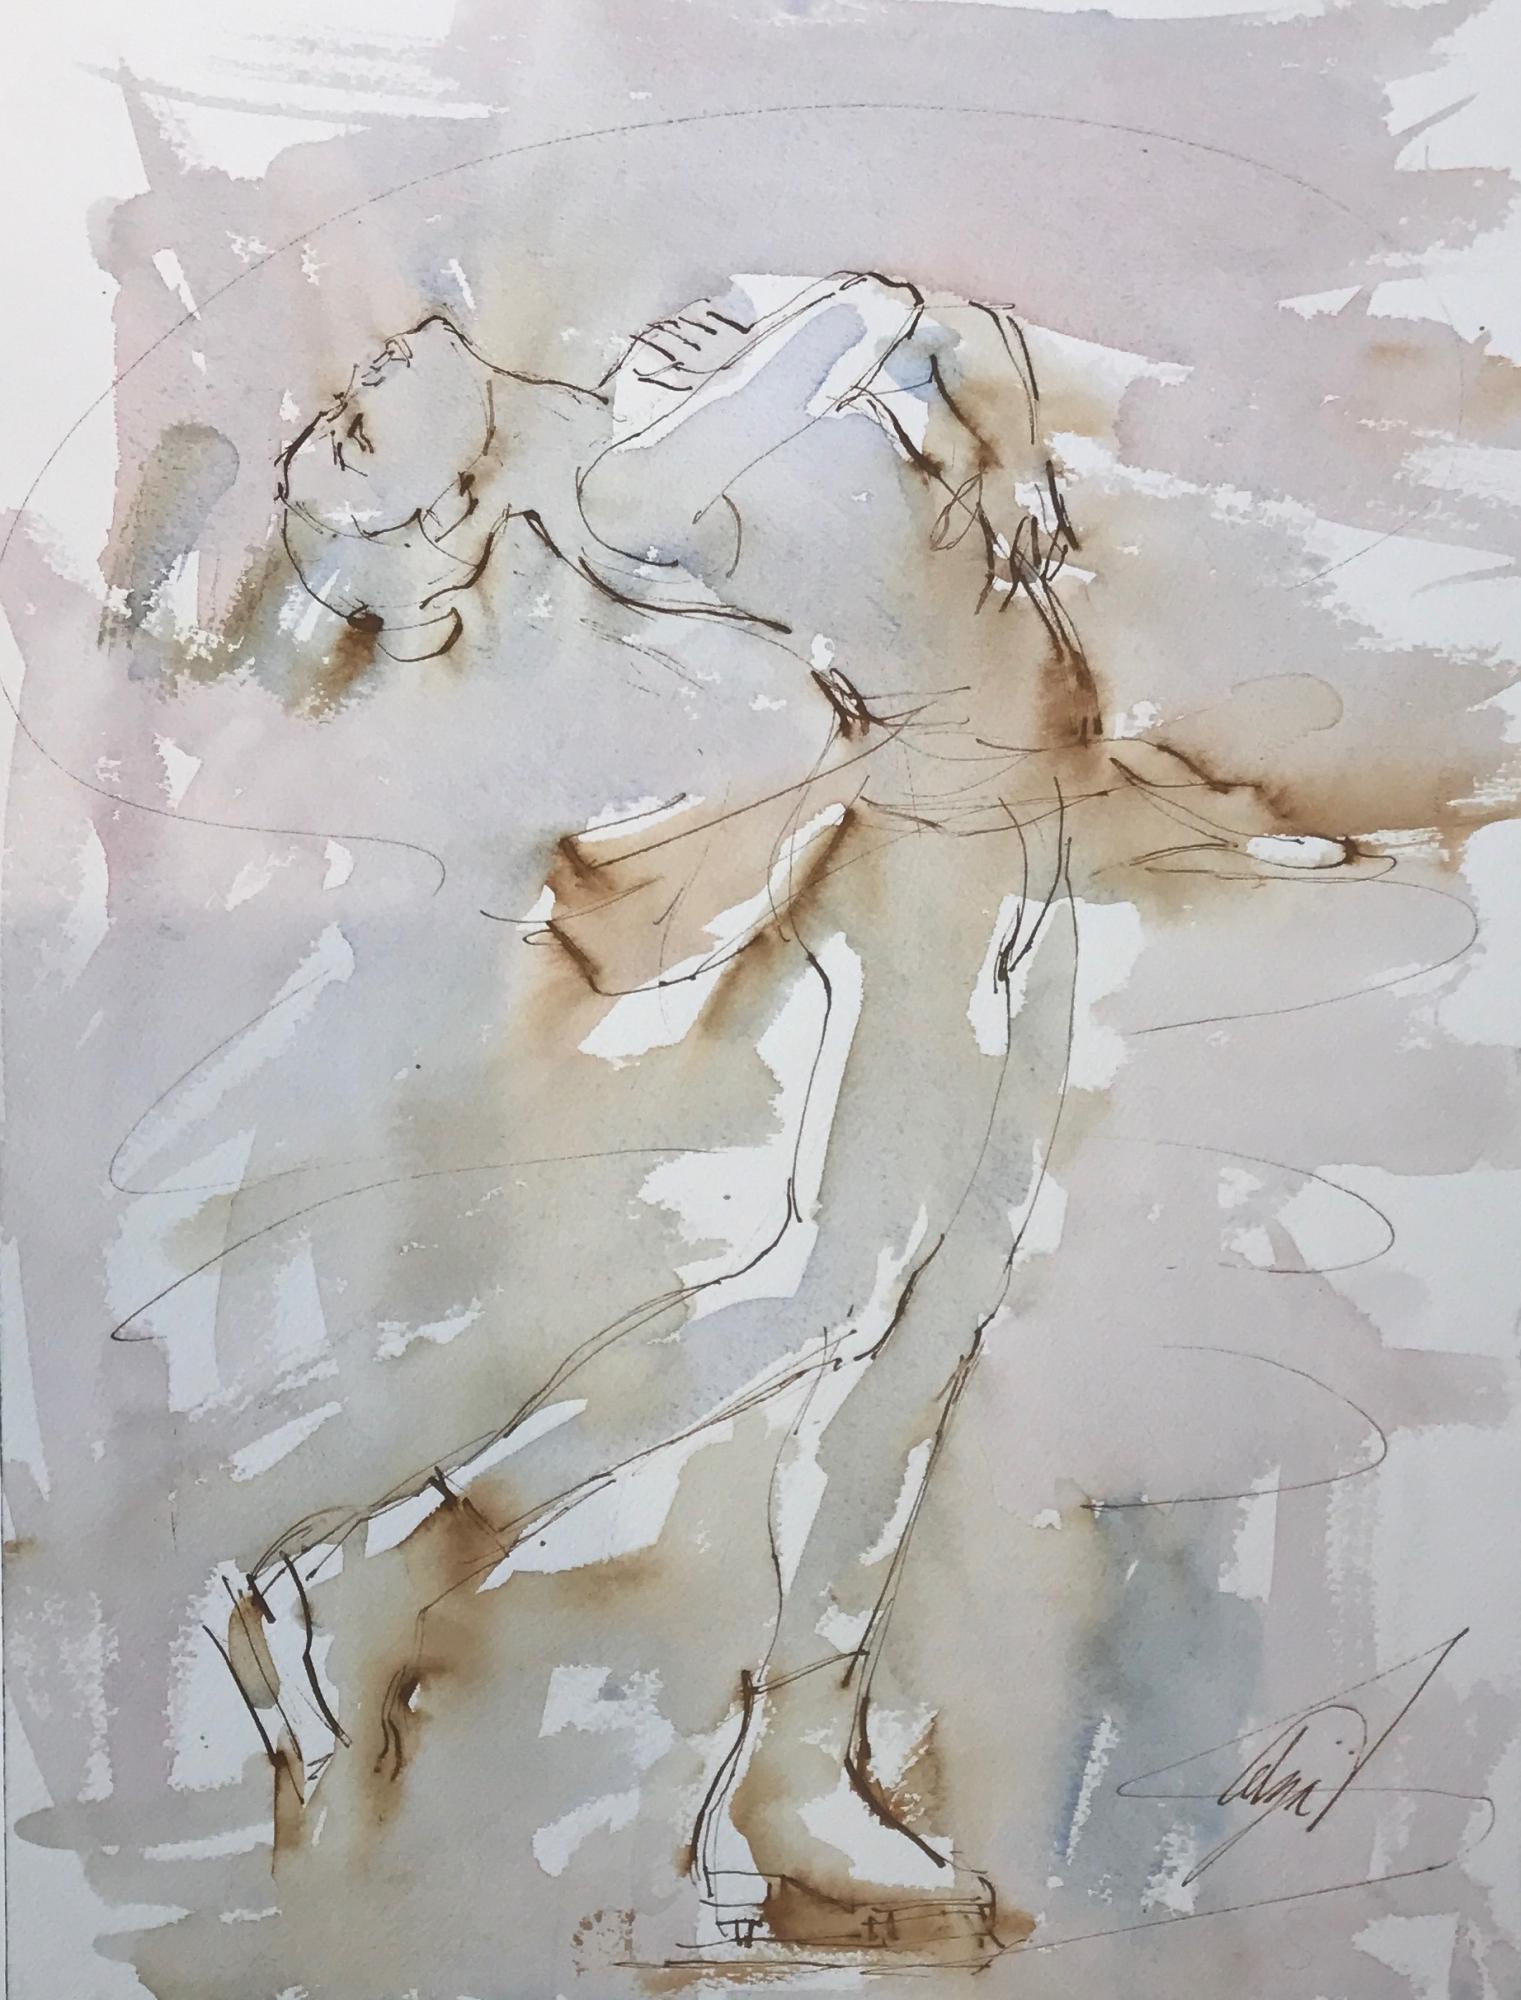 Layback Spin by Mel Delija